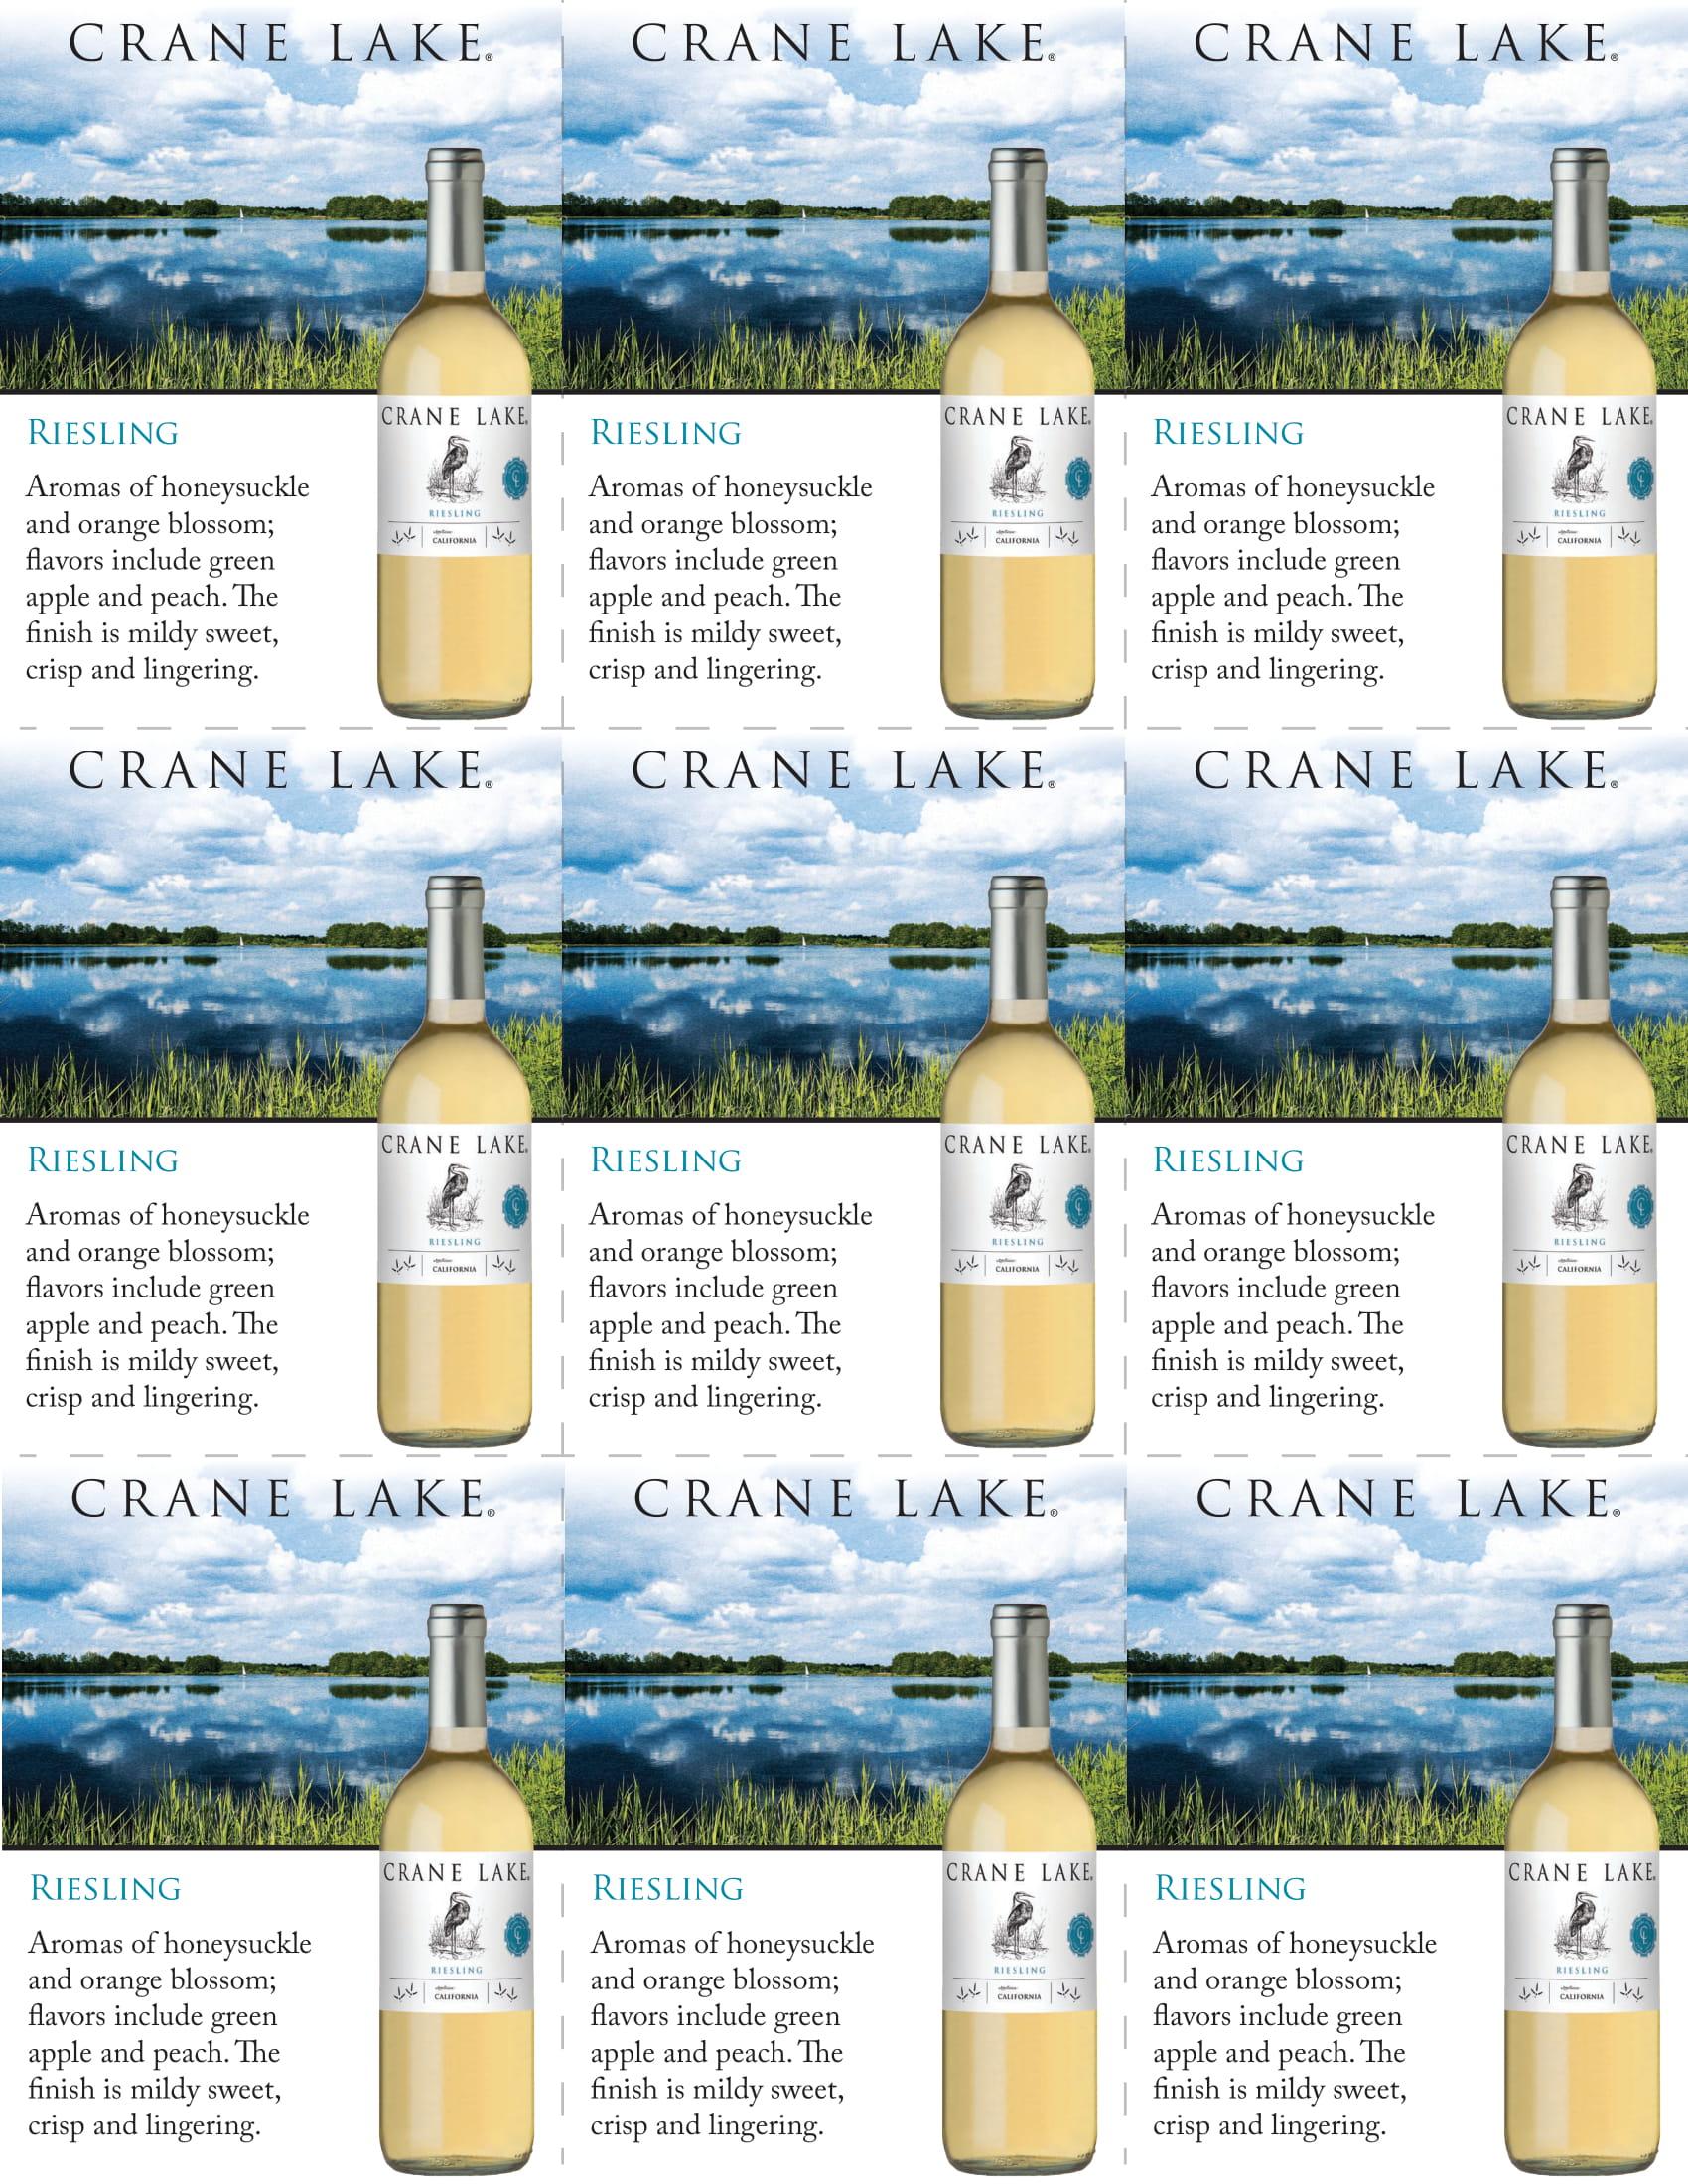 Crane Lake Riesling Shelf Talkers